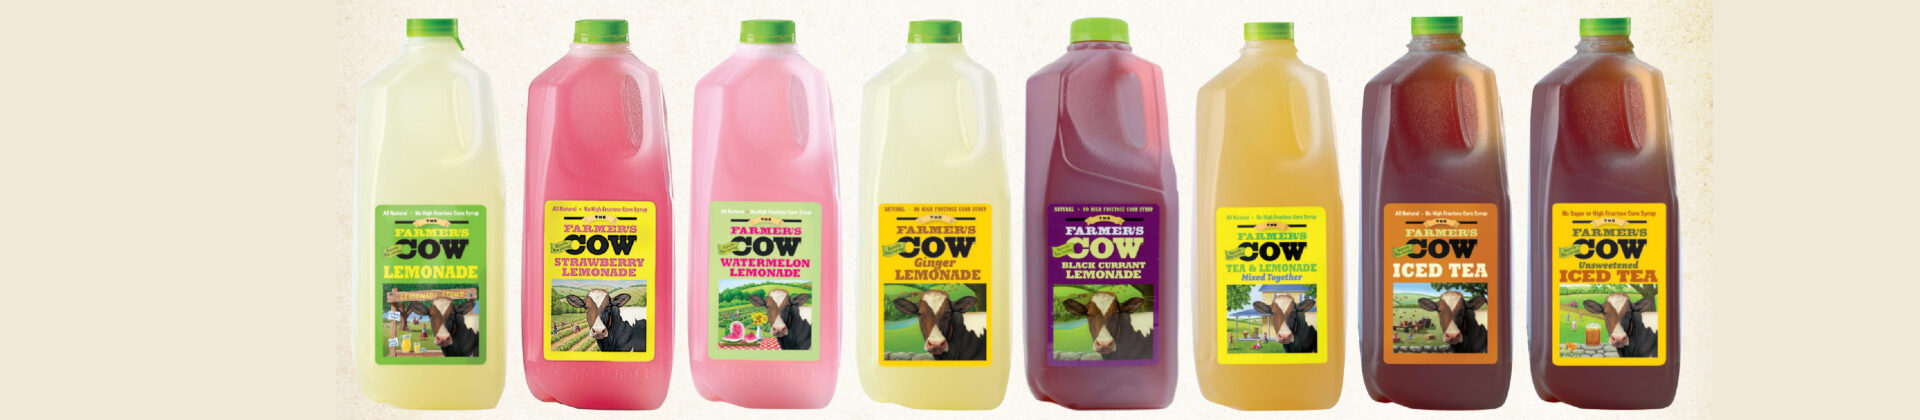 The Farmers Cow